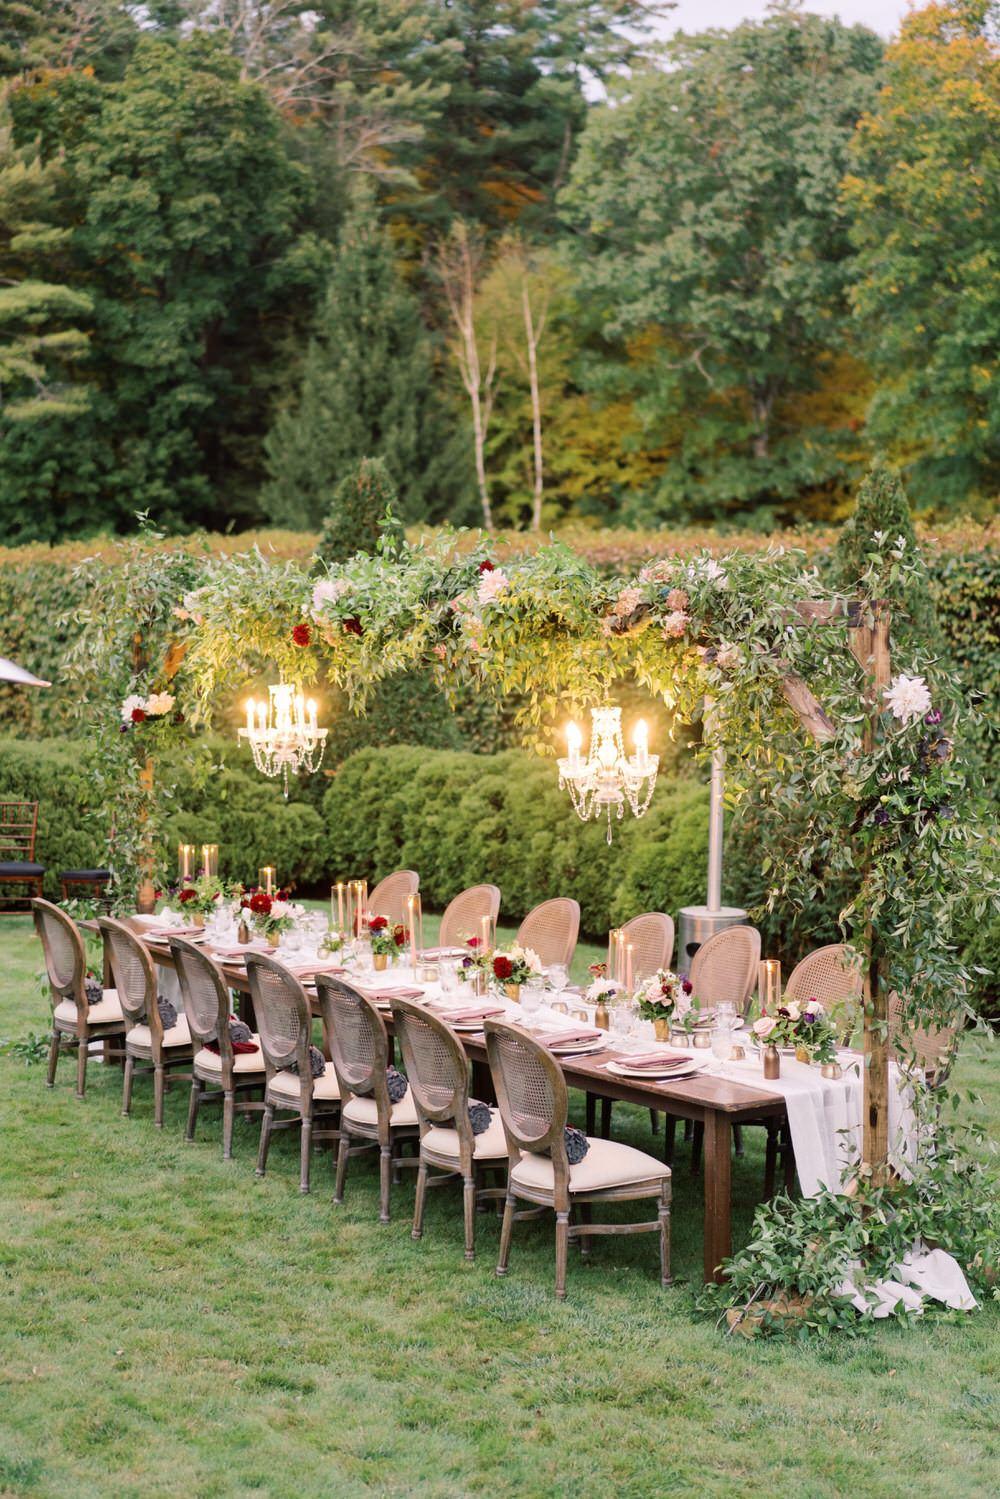 Intimate Berkshire Garden Wedding at The Mount ⋆ Ruffled